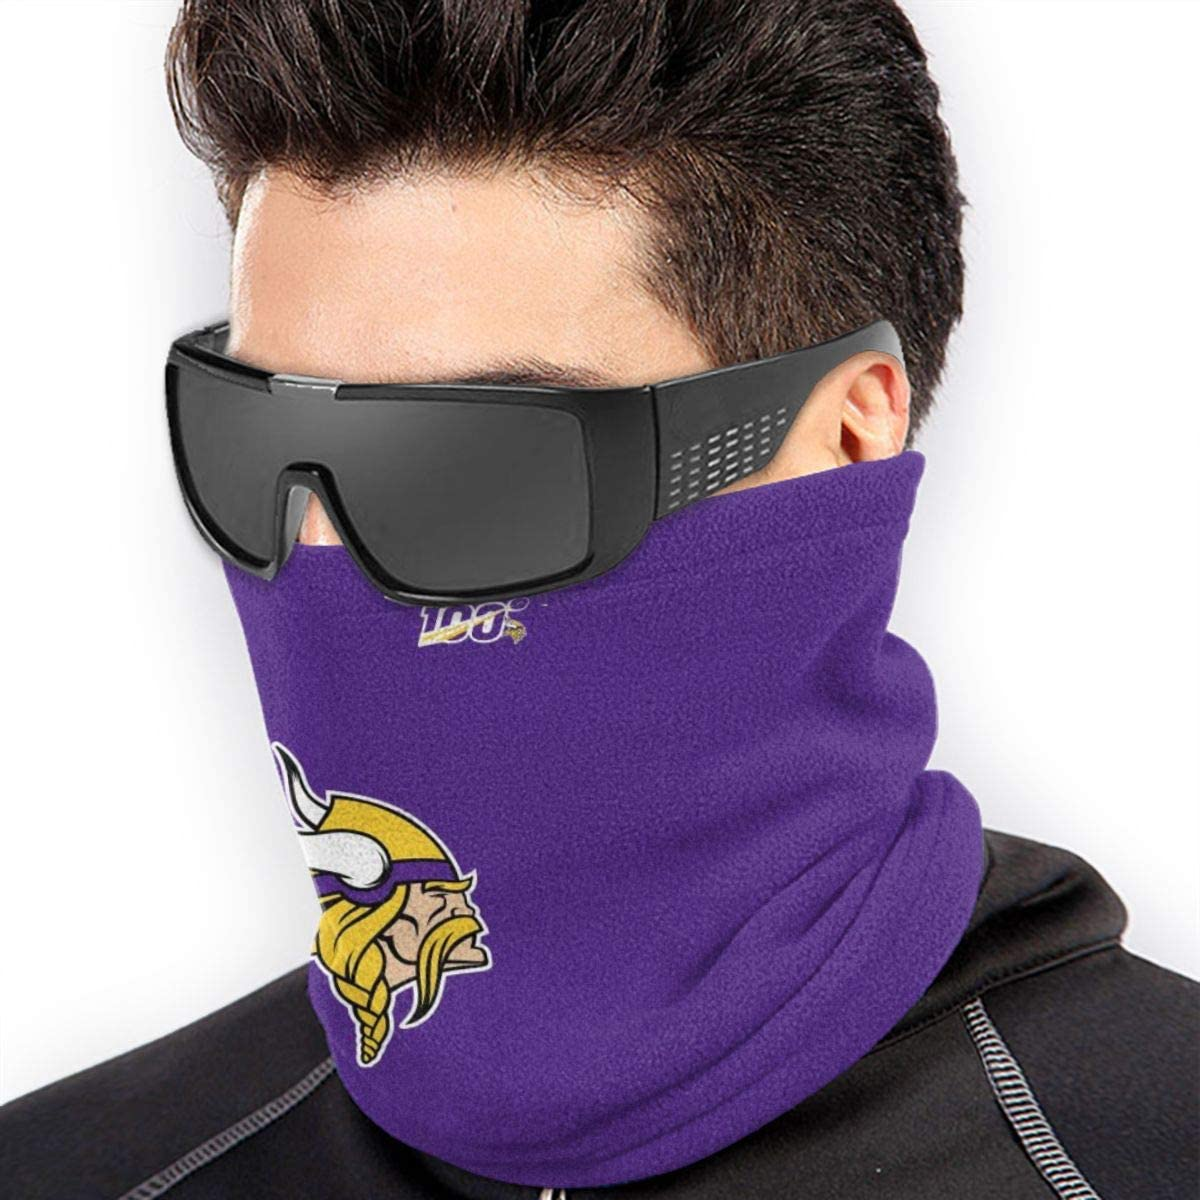 Windproof UV Protection Neck Gaiter Minnesota Vikings Art Print Neck Balaclava Motorcycle Riding Headwear Bandana For Dust